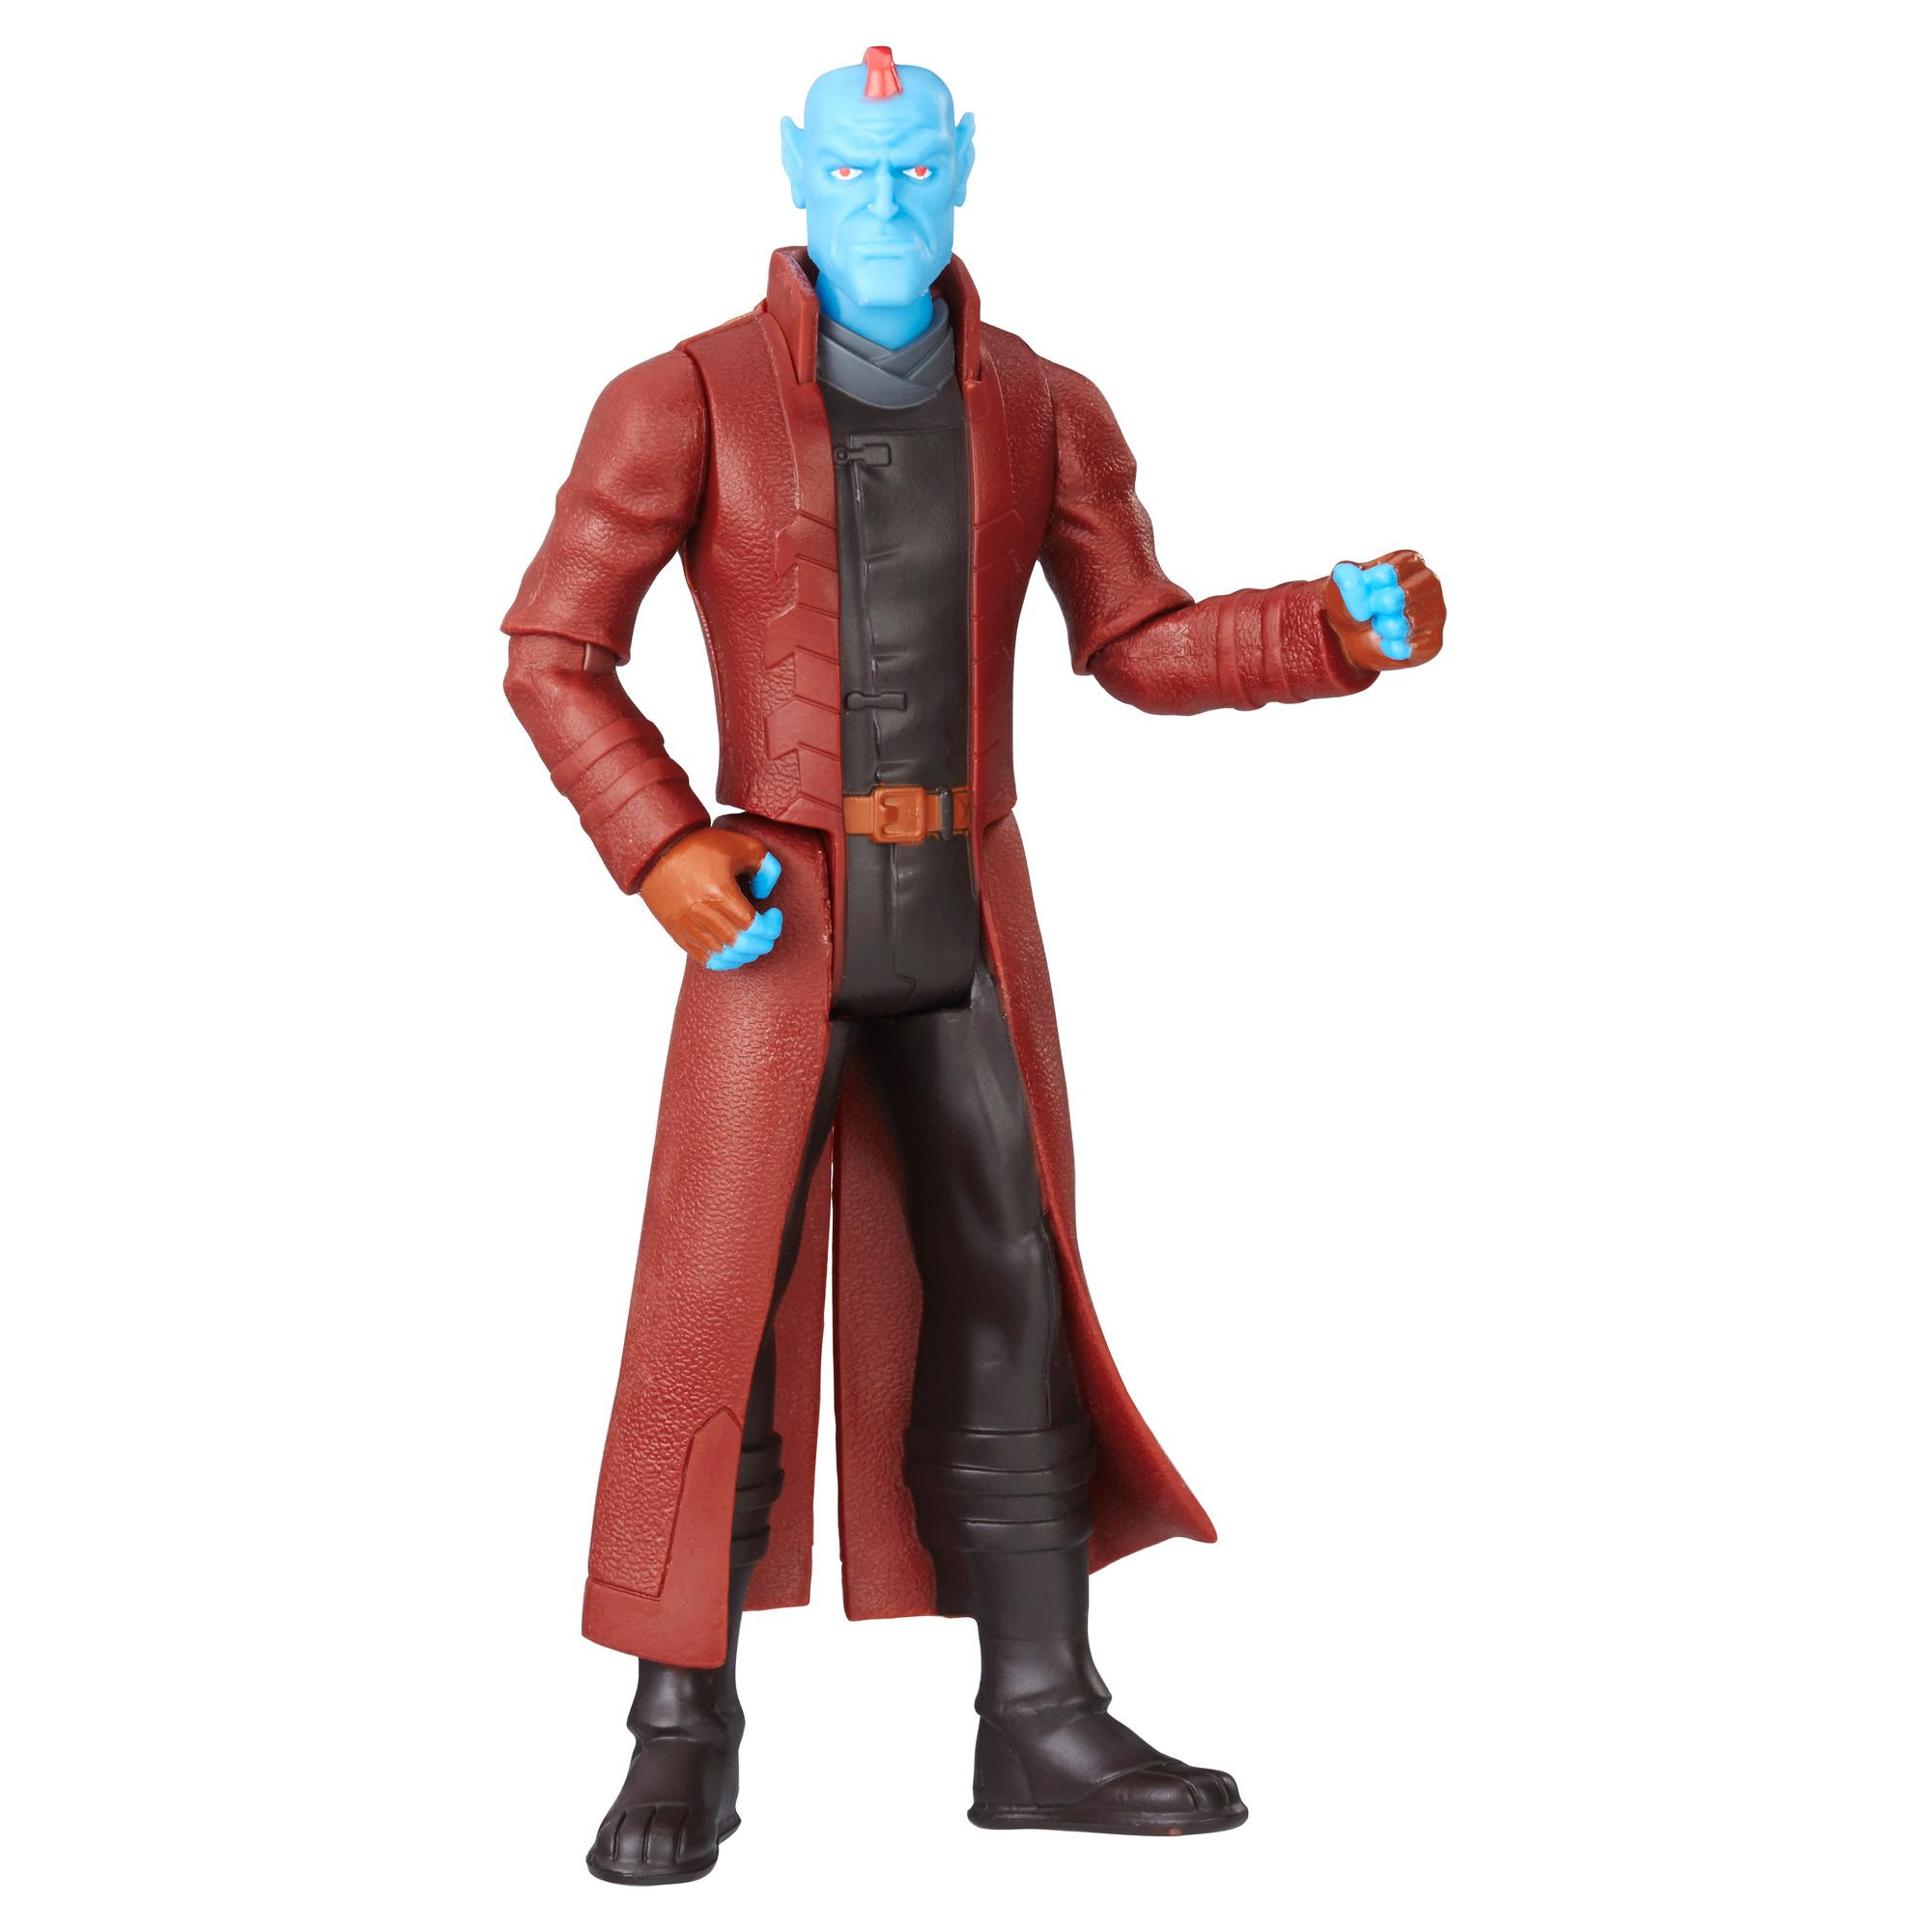 Marvel Guardians of the Galaxy 6-inch Yondu